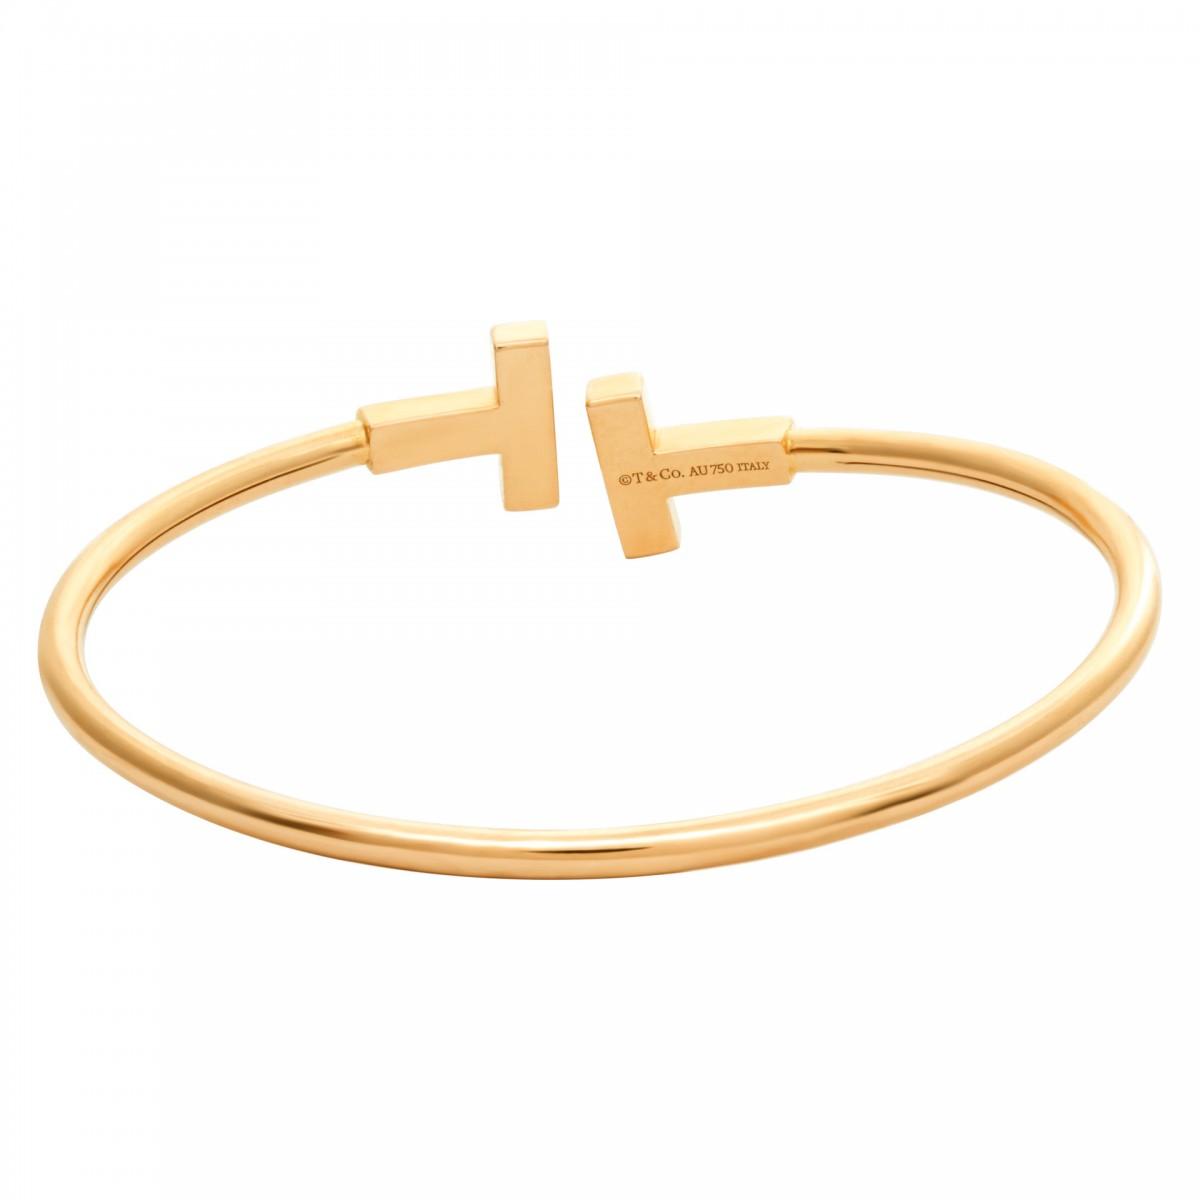 Tiffany Co T Wire Diamond Bracelet In 18k Rose Gold 0 22 Carat S